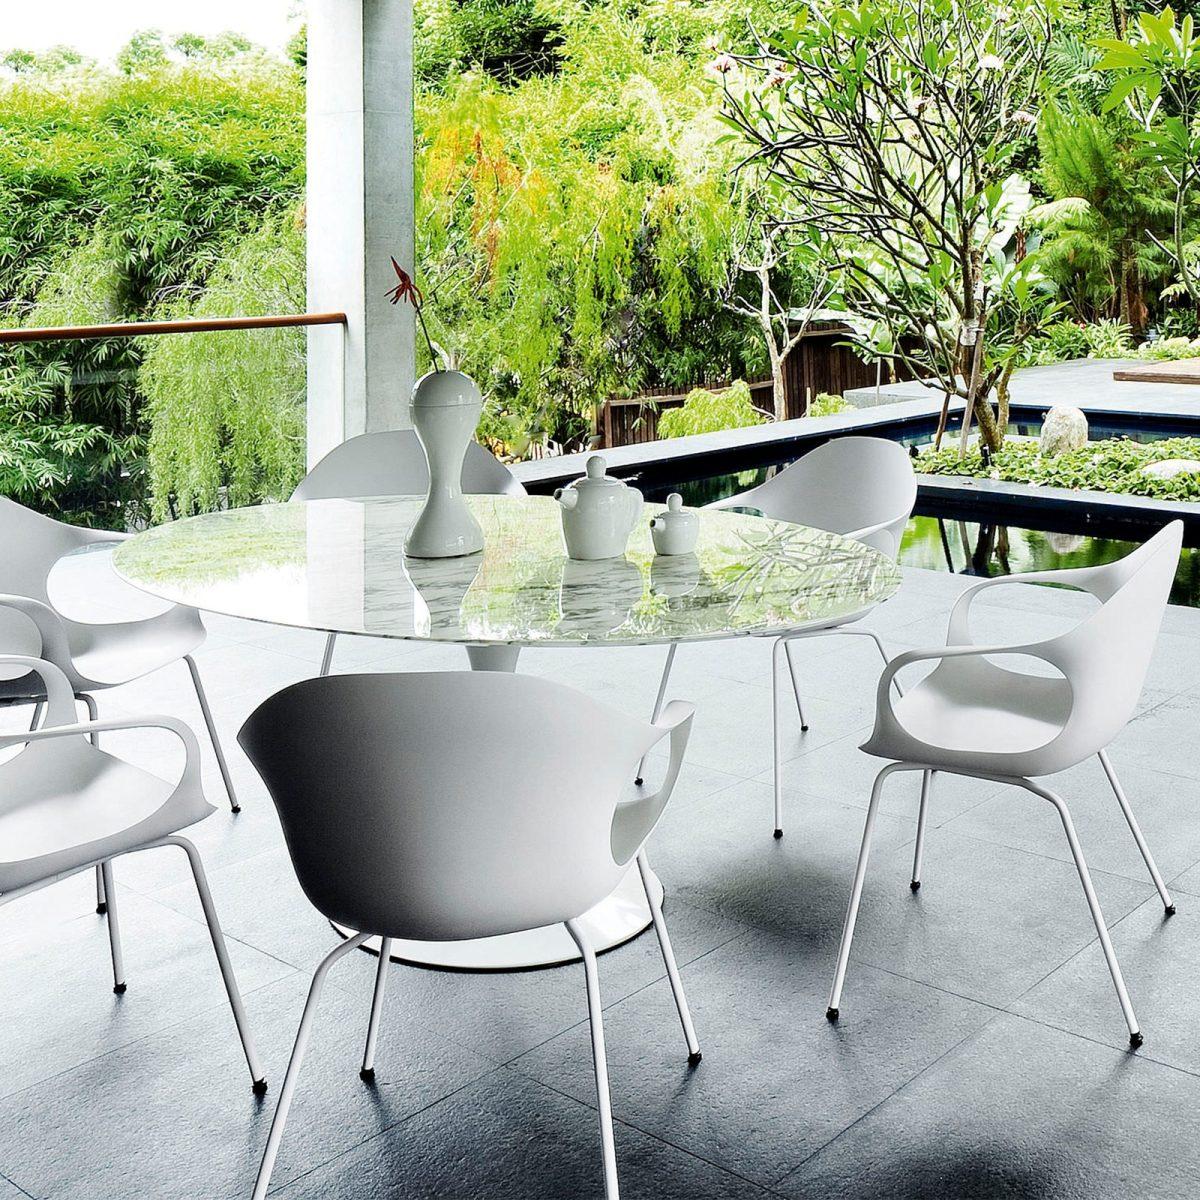 Möbel - Stühle - Elephant Wood Sessel - Kristalia - weiß - Buchenfurnier, lackiertes Polyurhethan